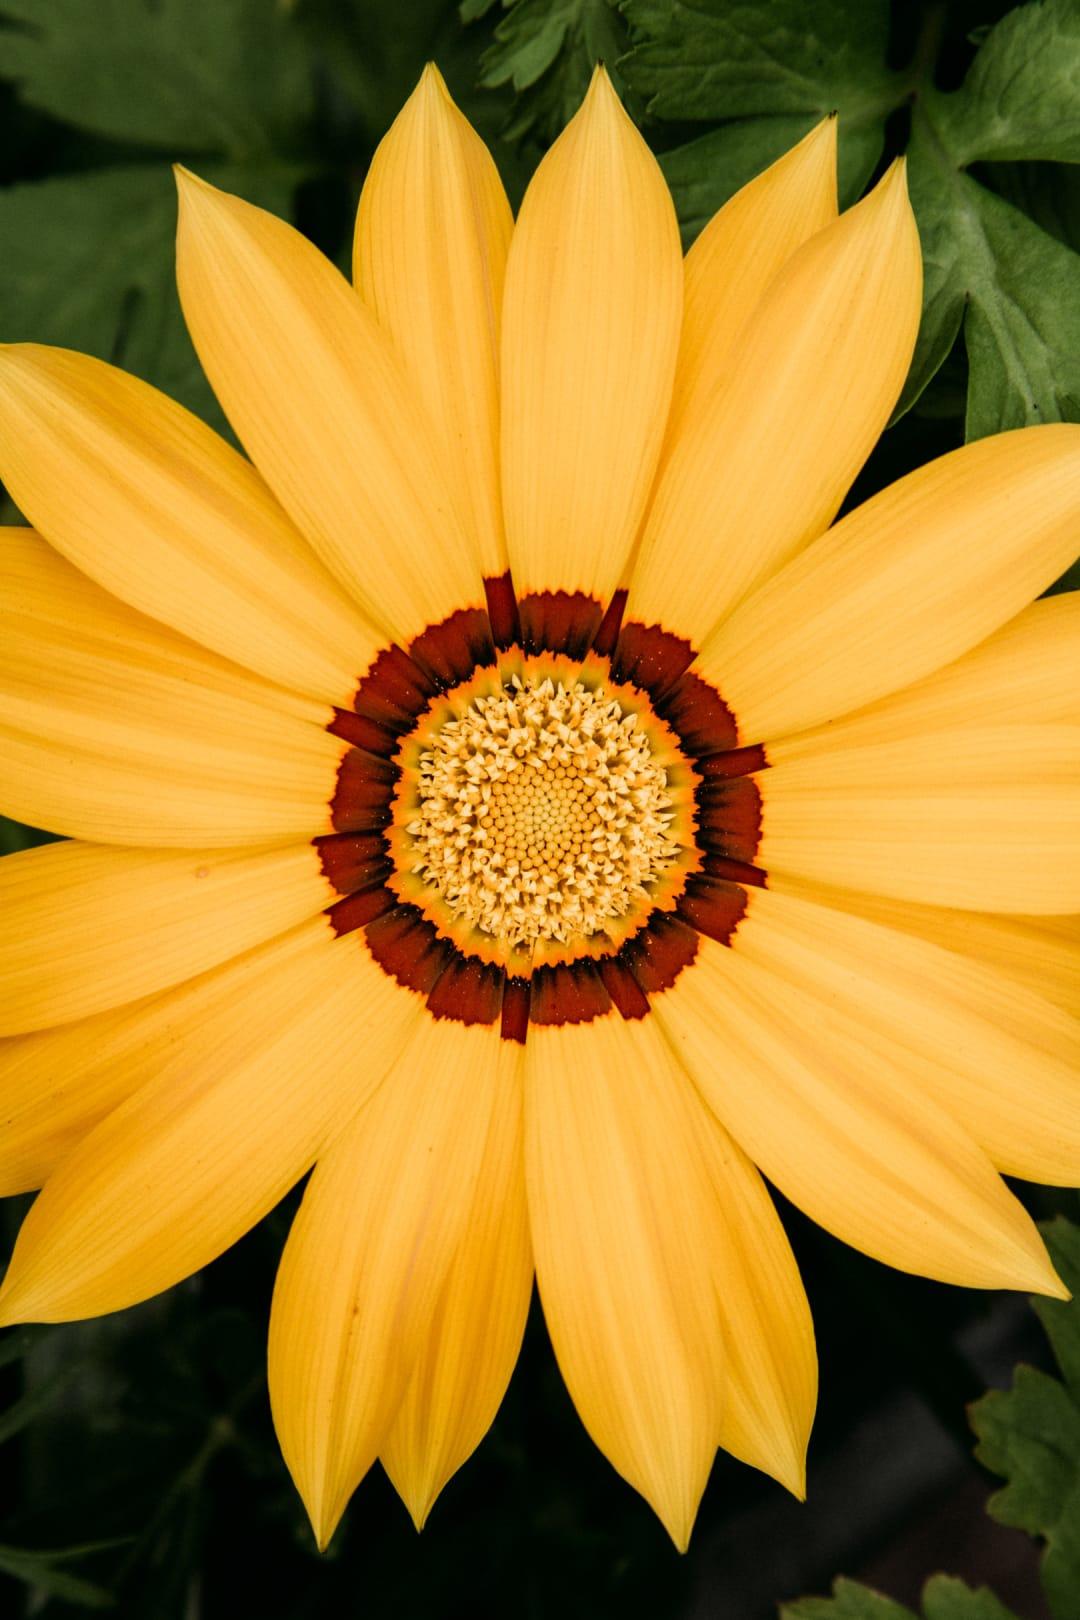 A close up photo of a yellow Gazania flower